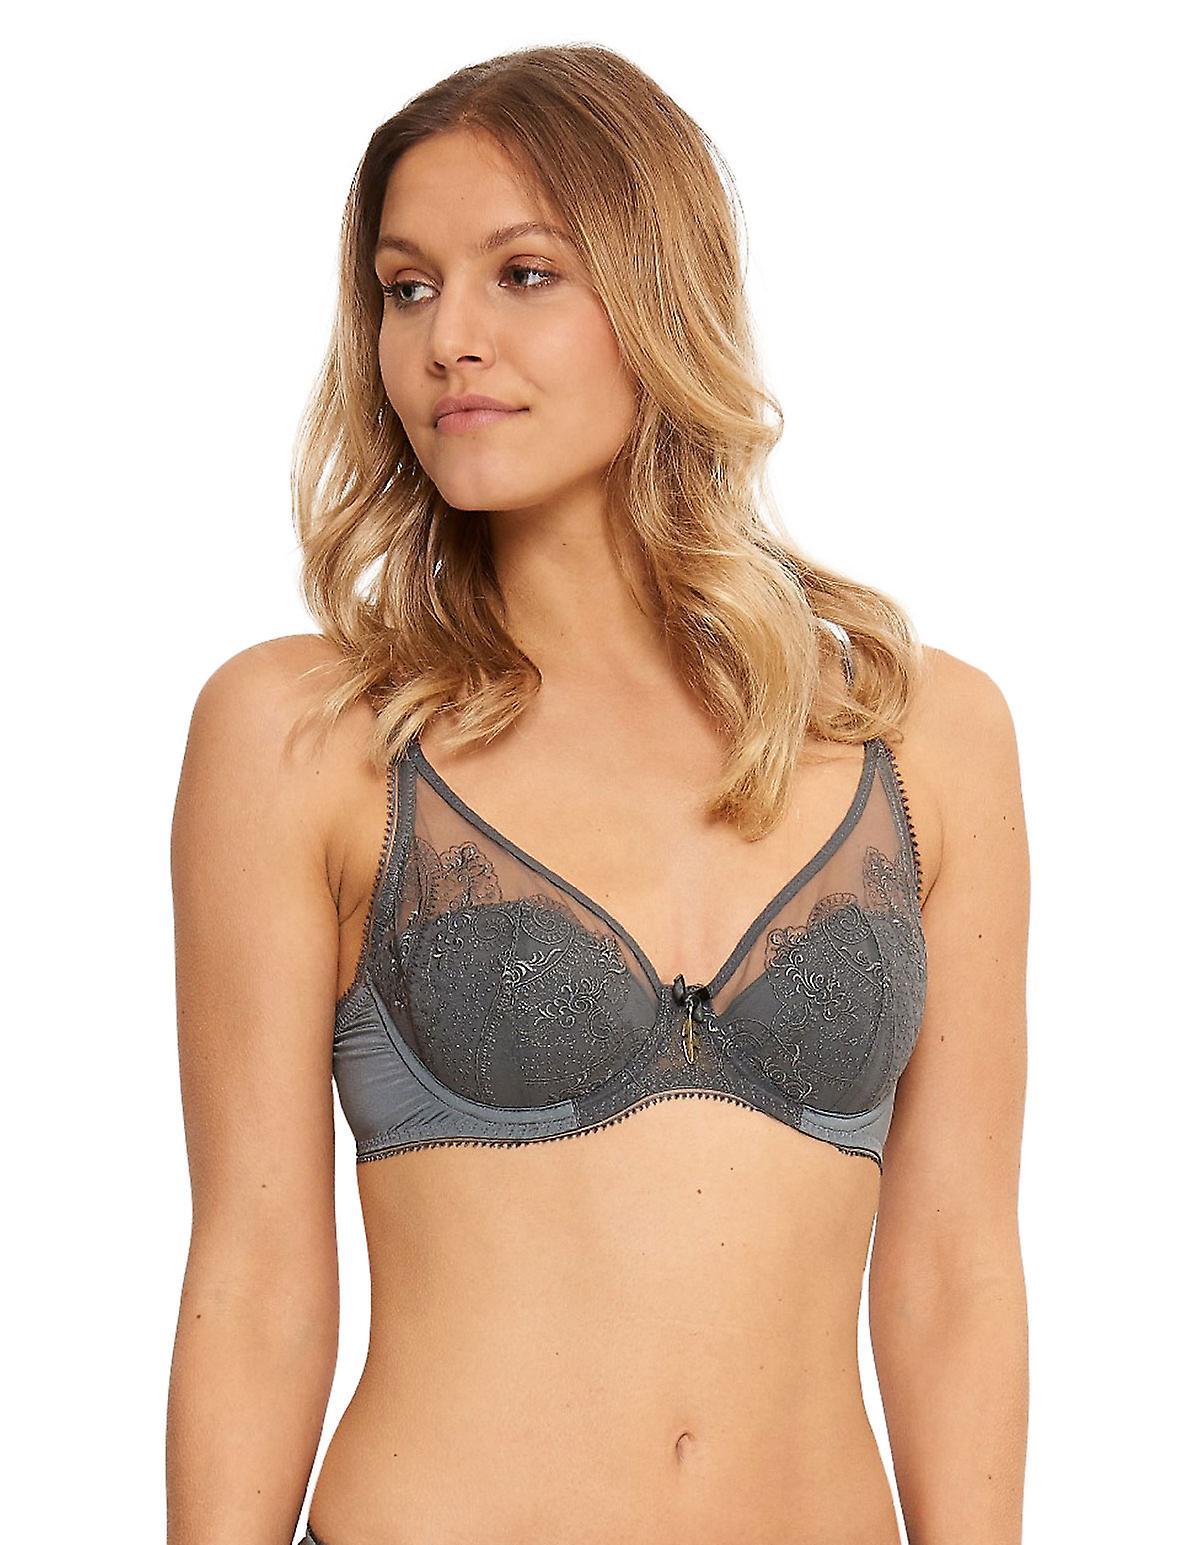 Bing Com 143 305 70: LingaDore 4229A-143 Women's Urban Grey Half Padded Bra